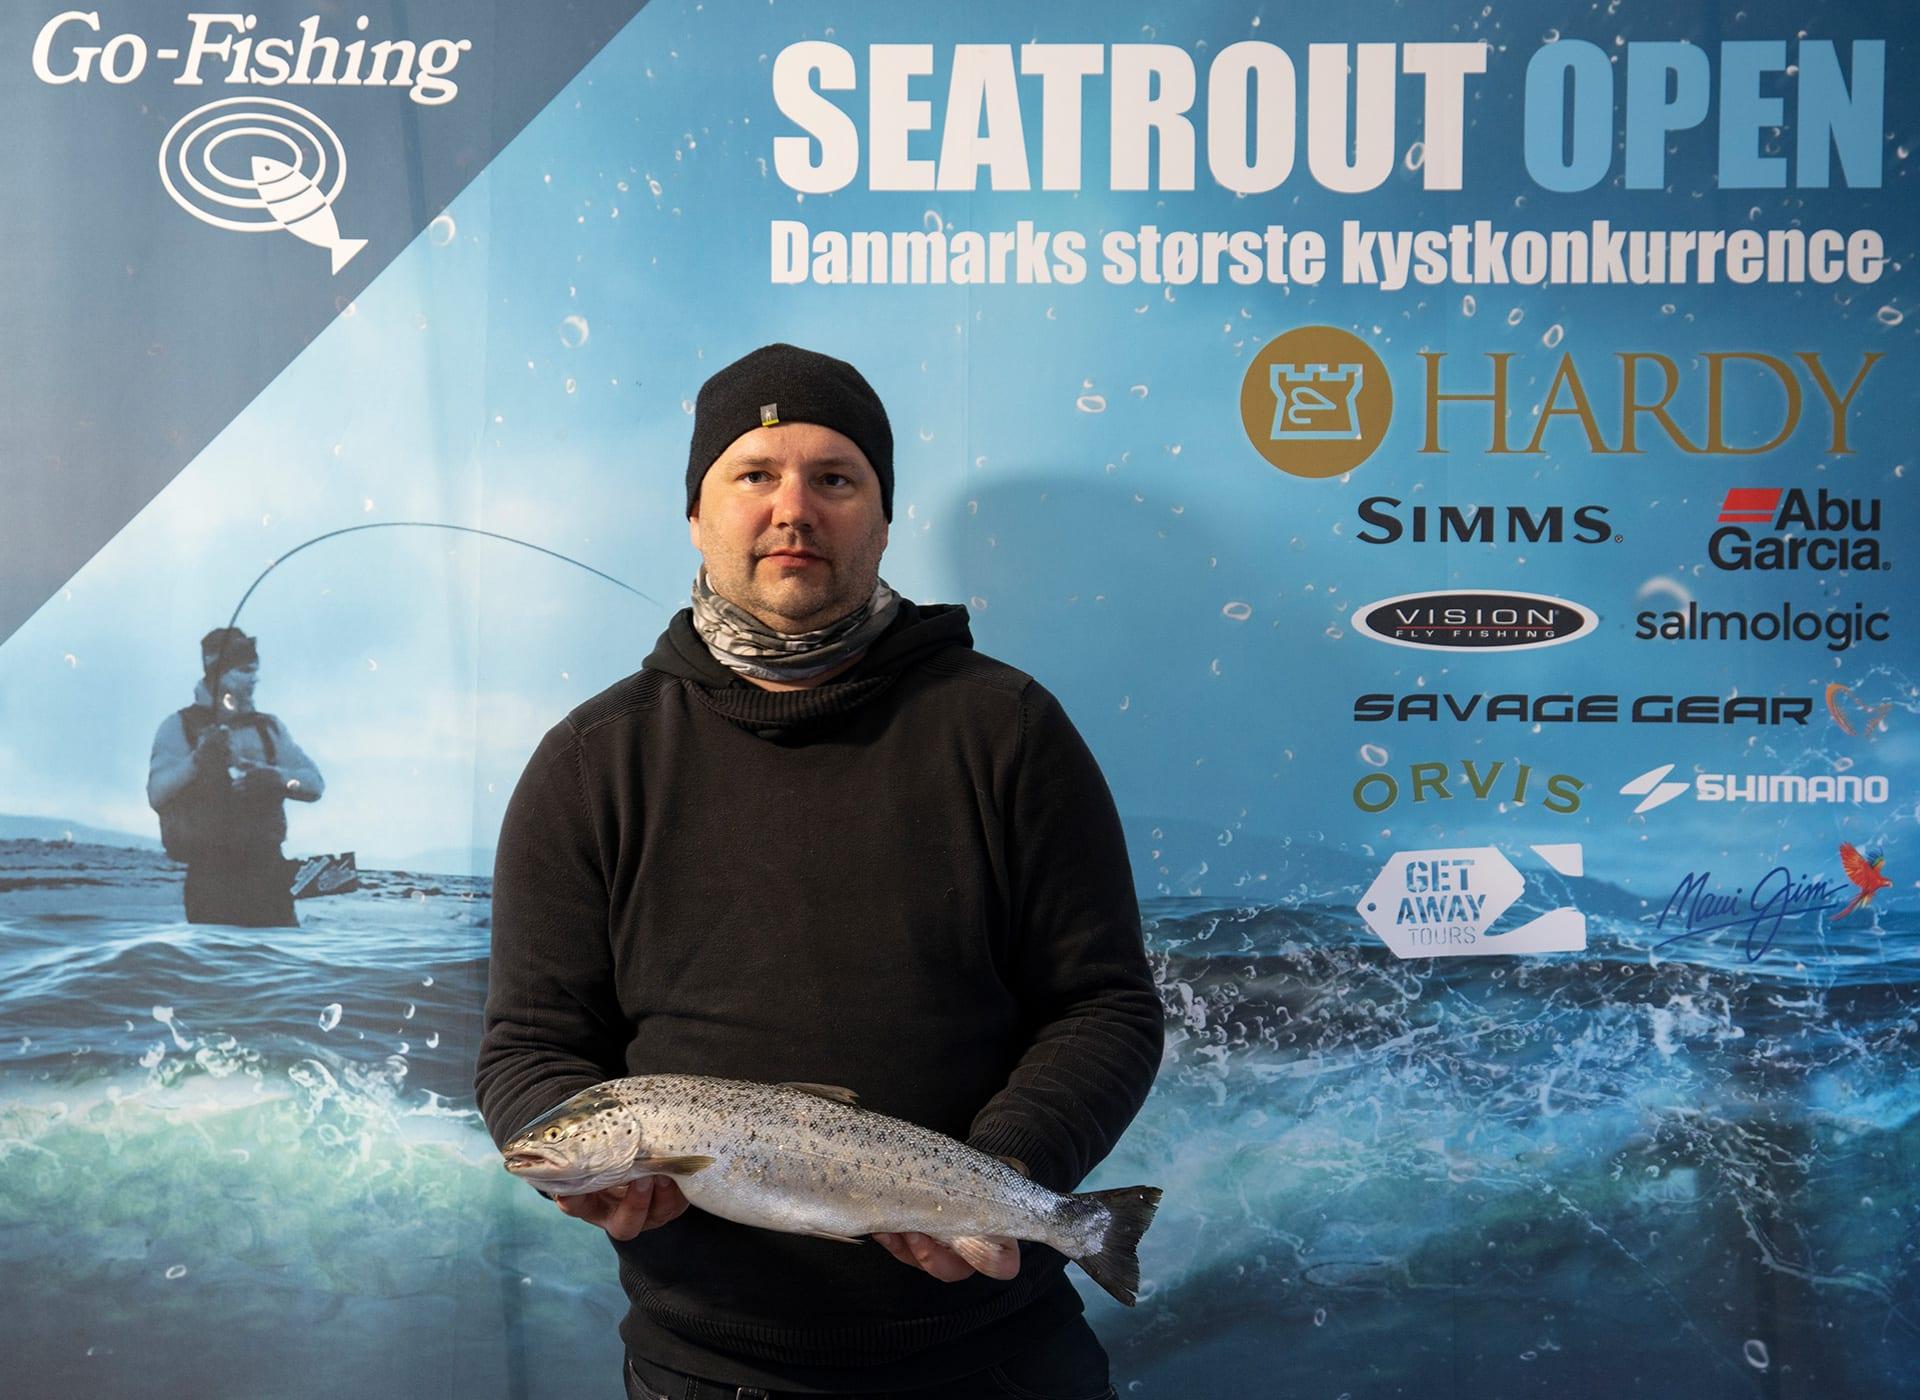 Seatrout Open deltager Kim Thomsen